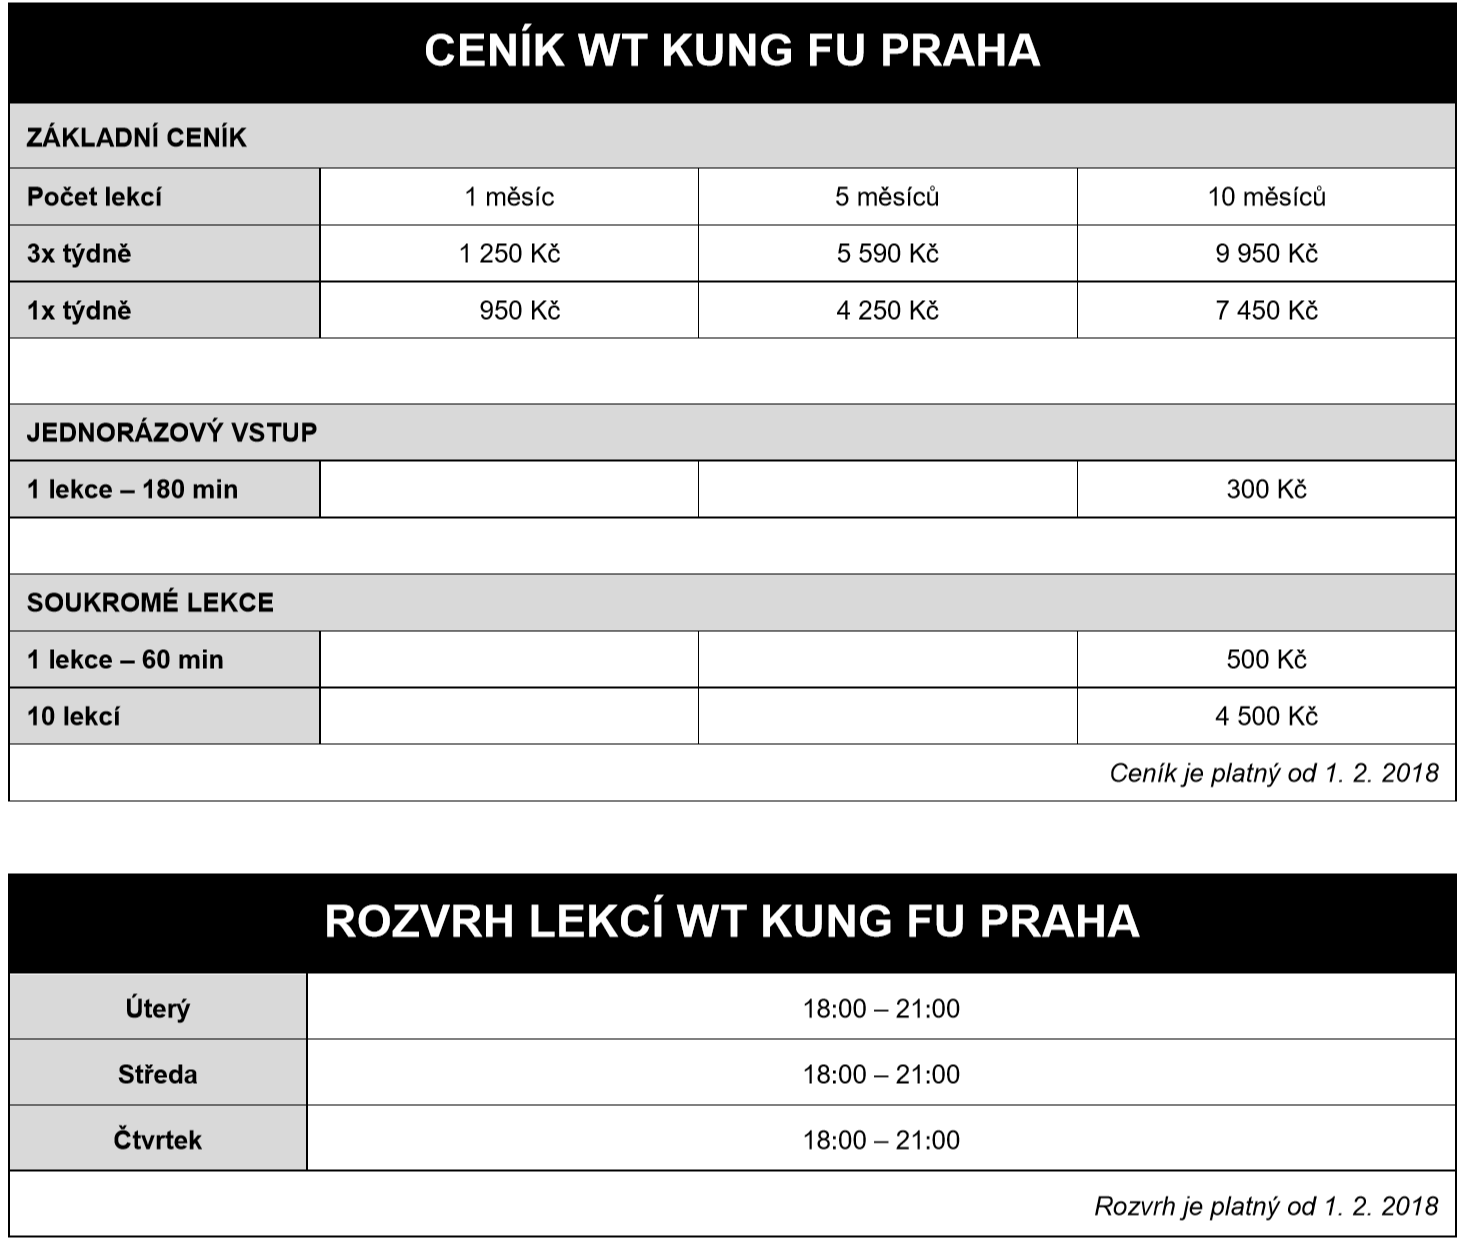 Wing Tsun Kung Fu Praha Ceník a Rozvrh Lekcí